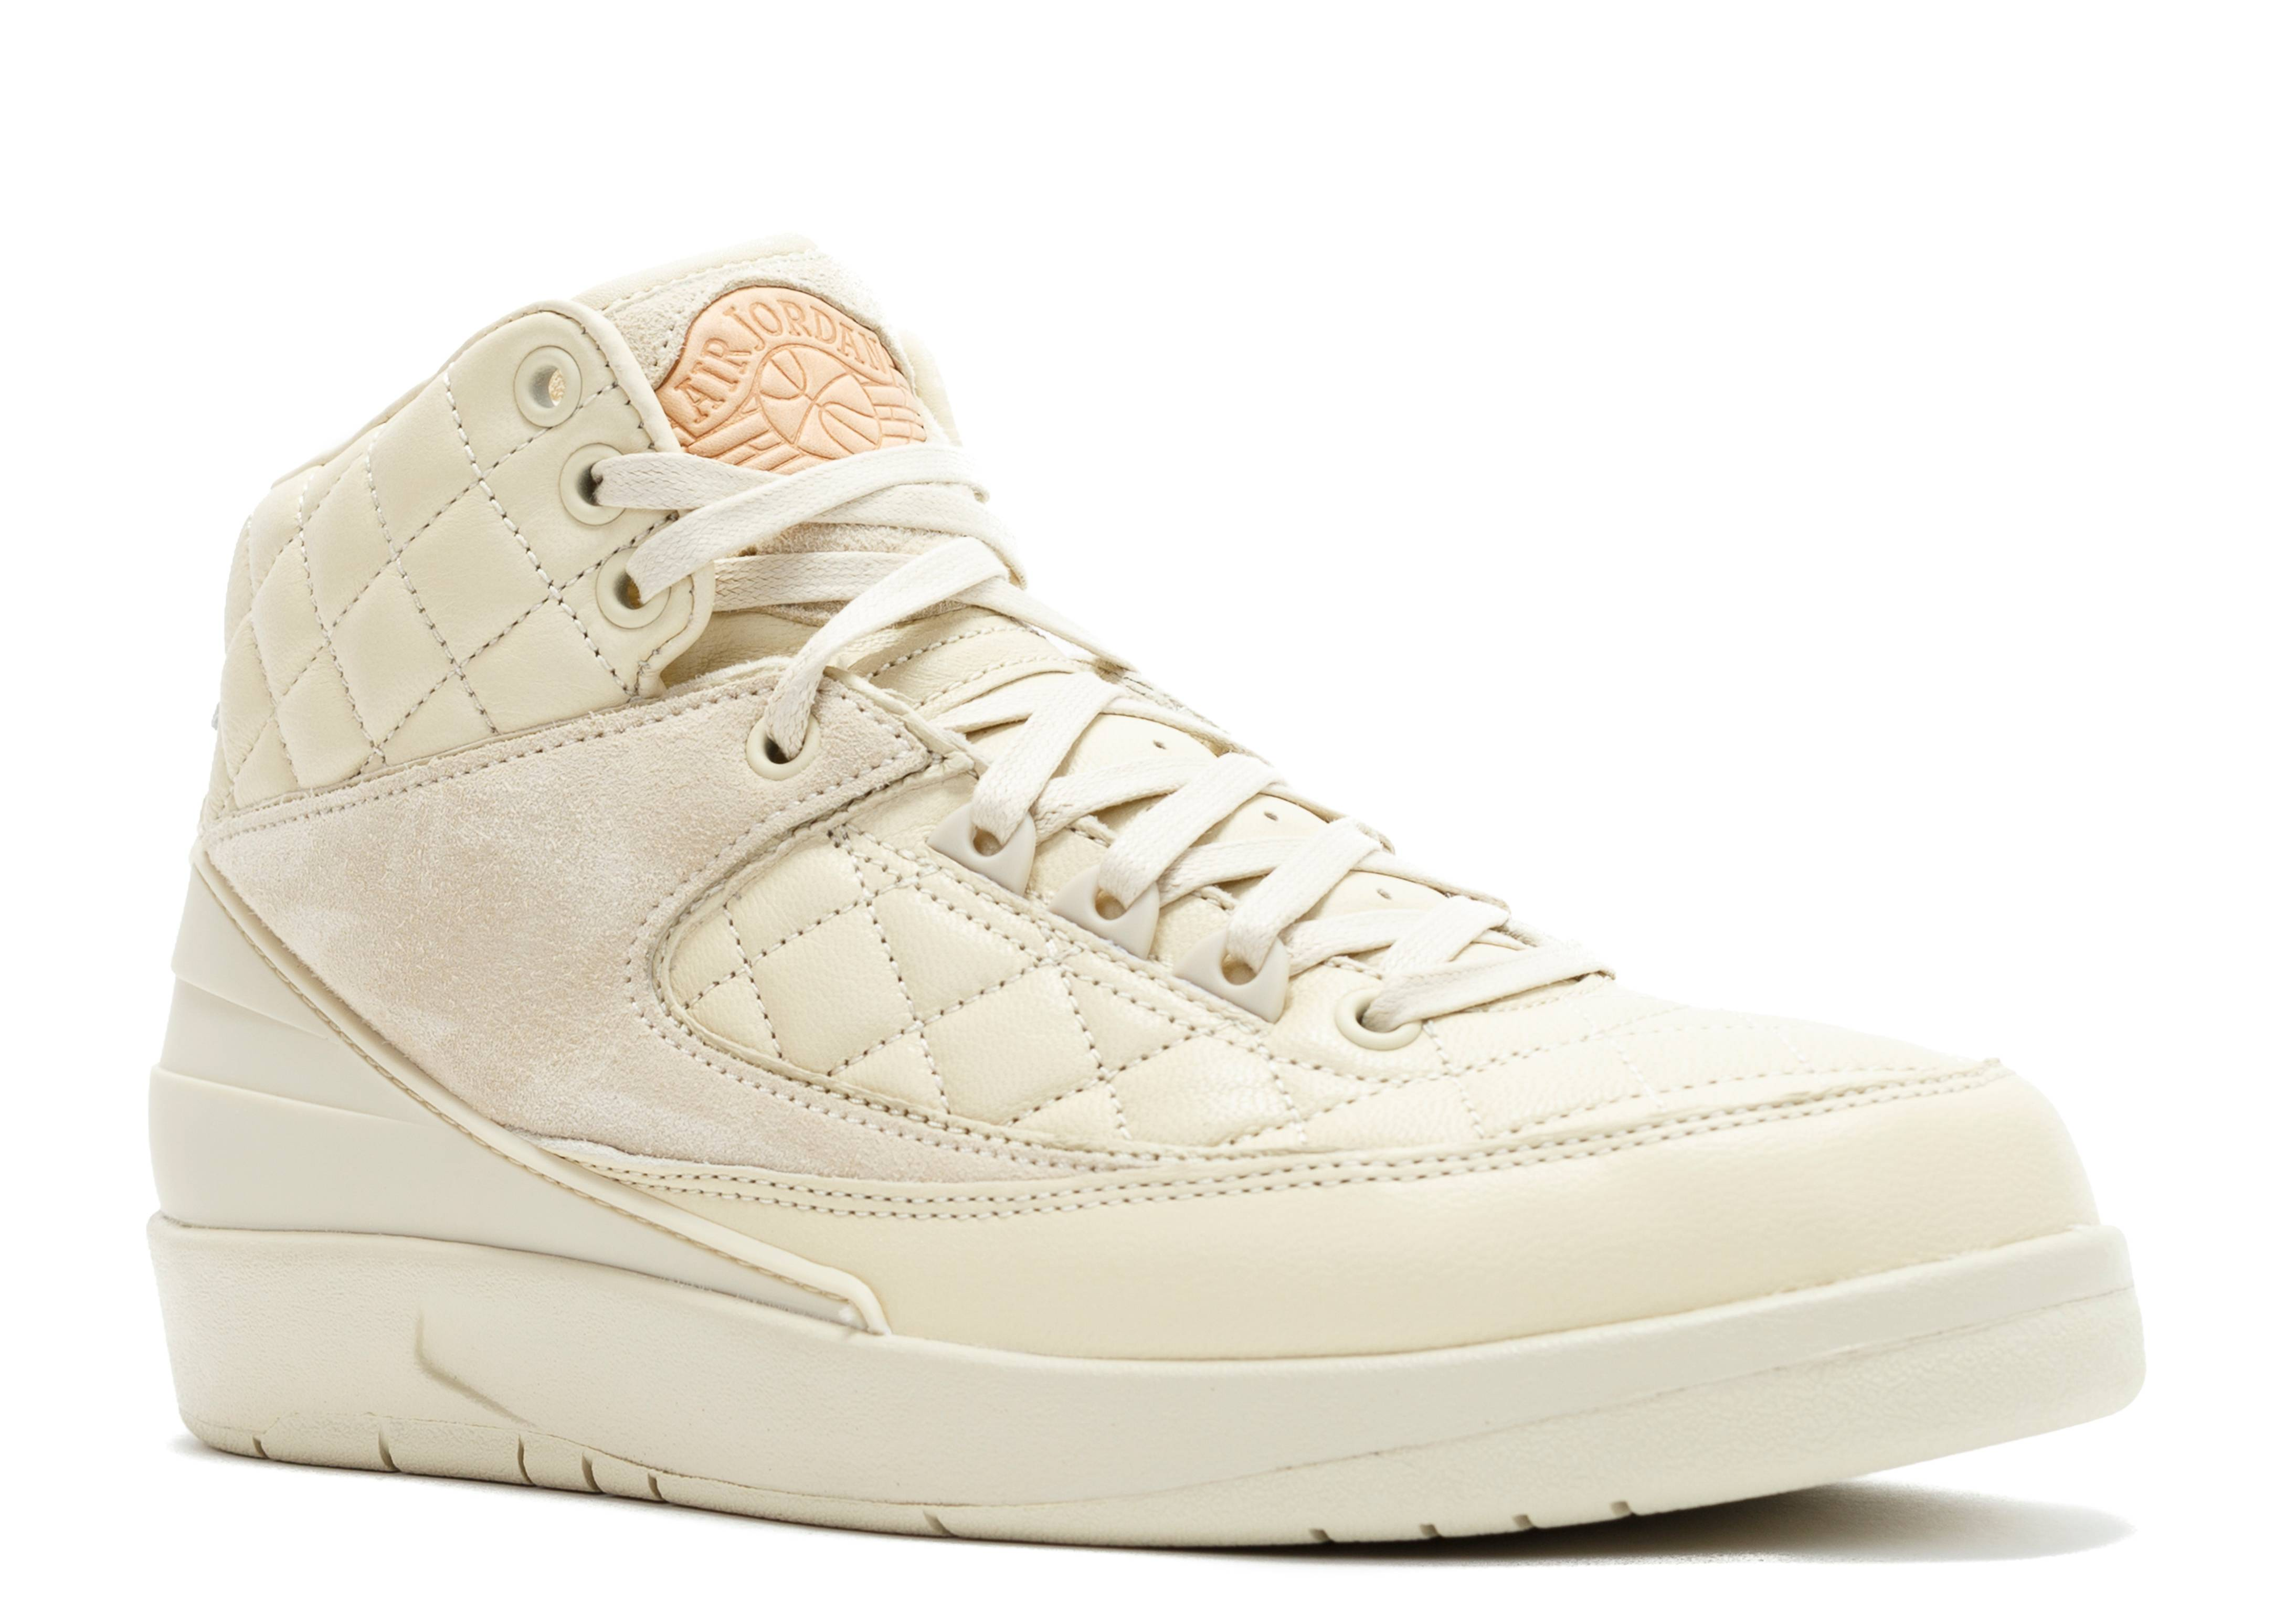 separation shoes 755bc 4ad82 ... germany air jordan 2 retro just don don c beach 9531b 4b919